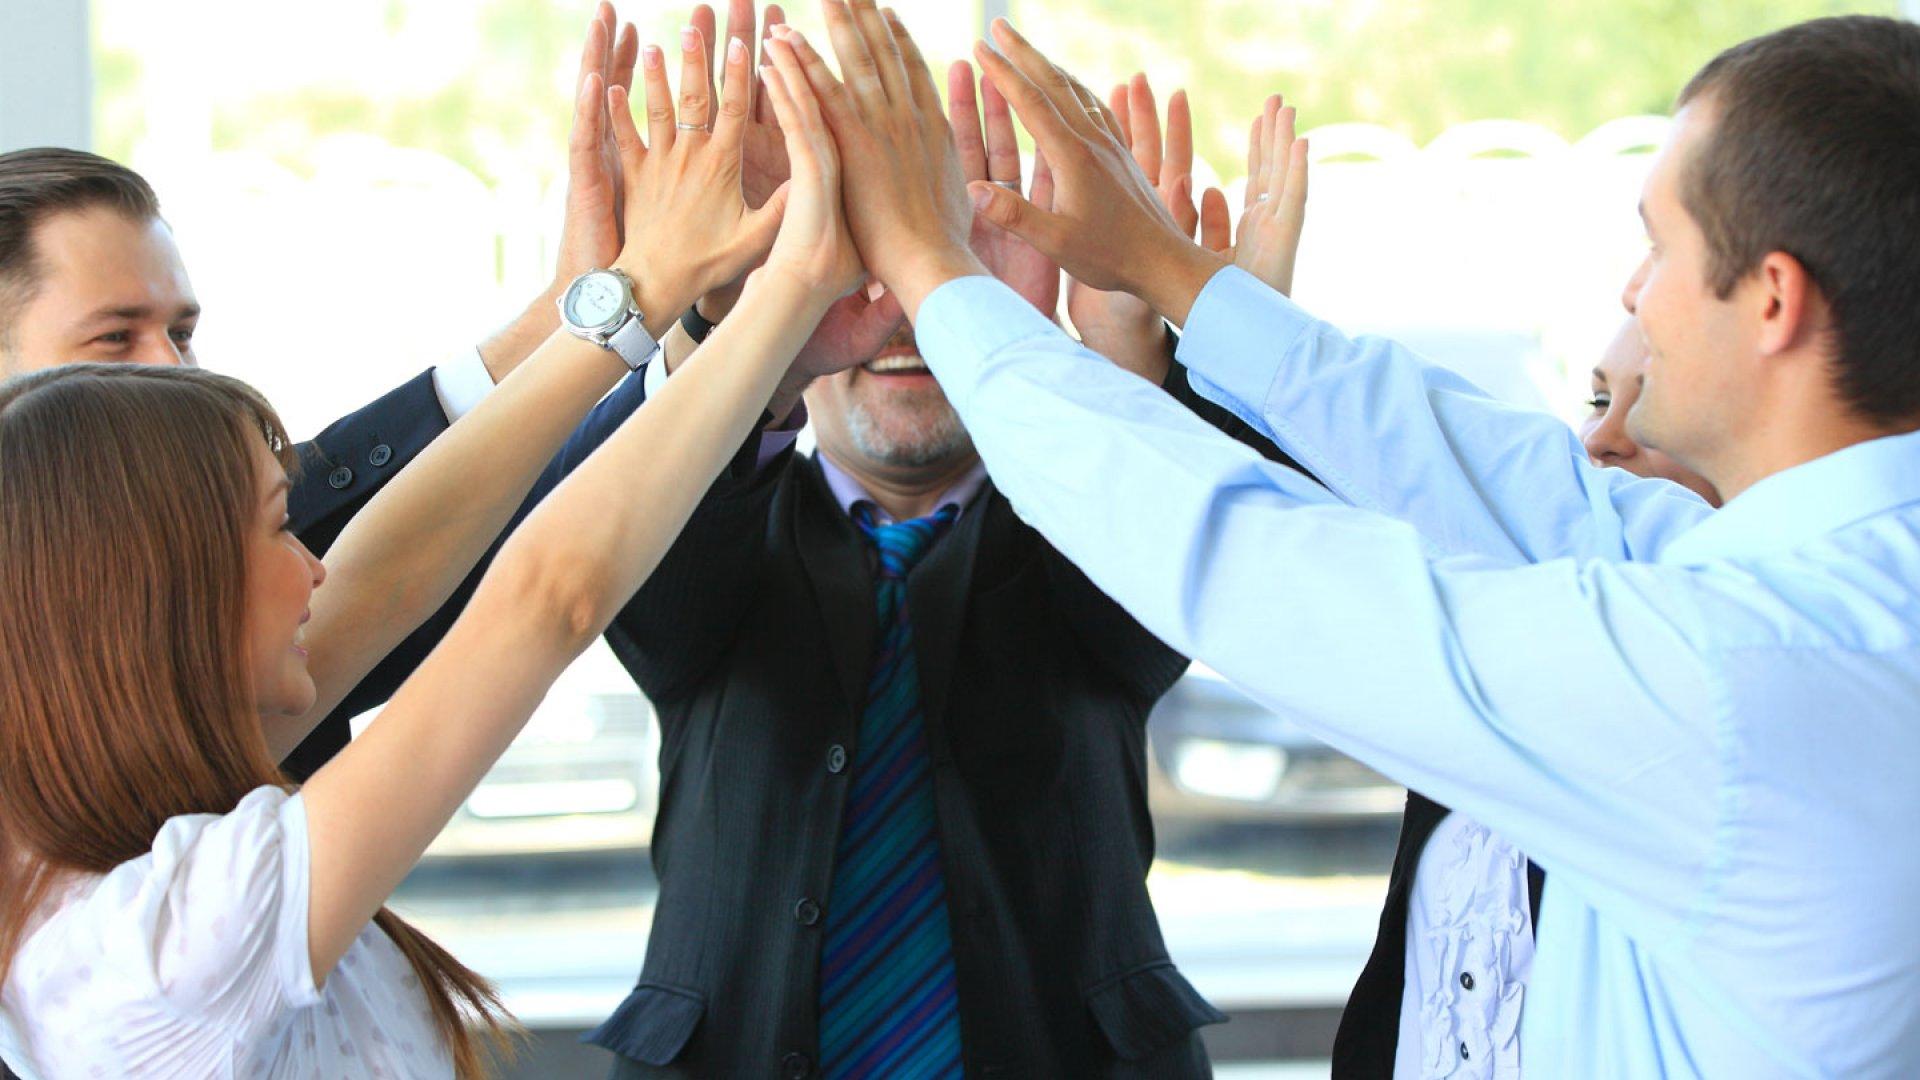 3 Easy Ways to Make Employees Happy